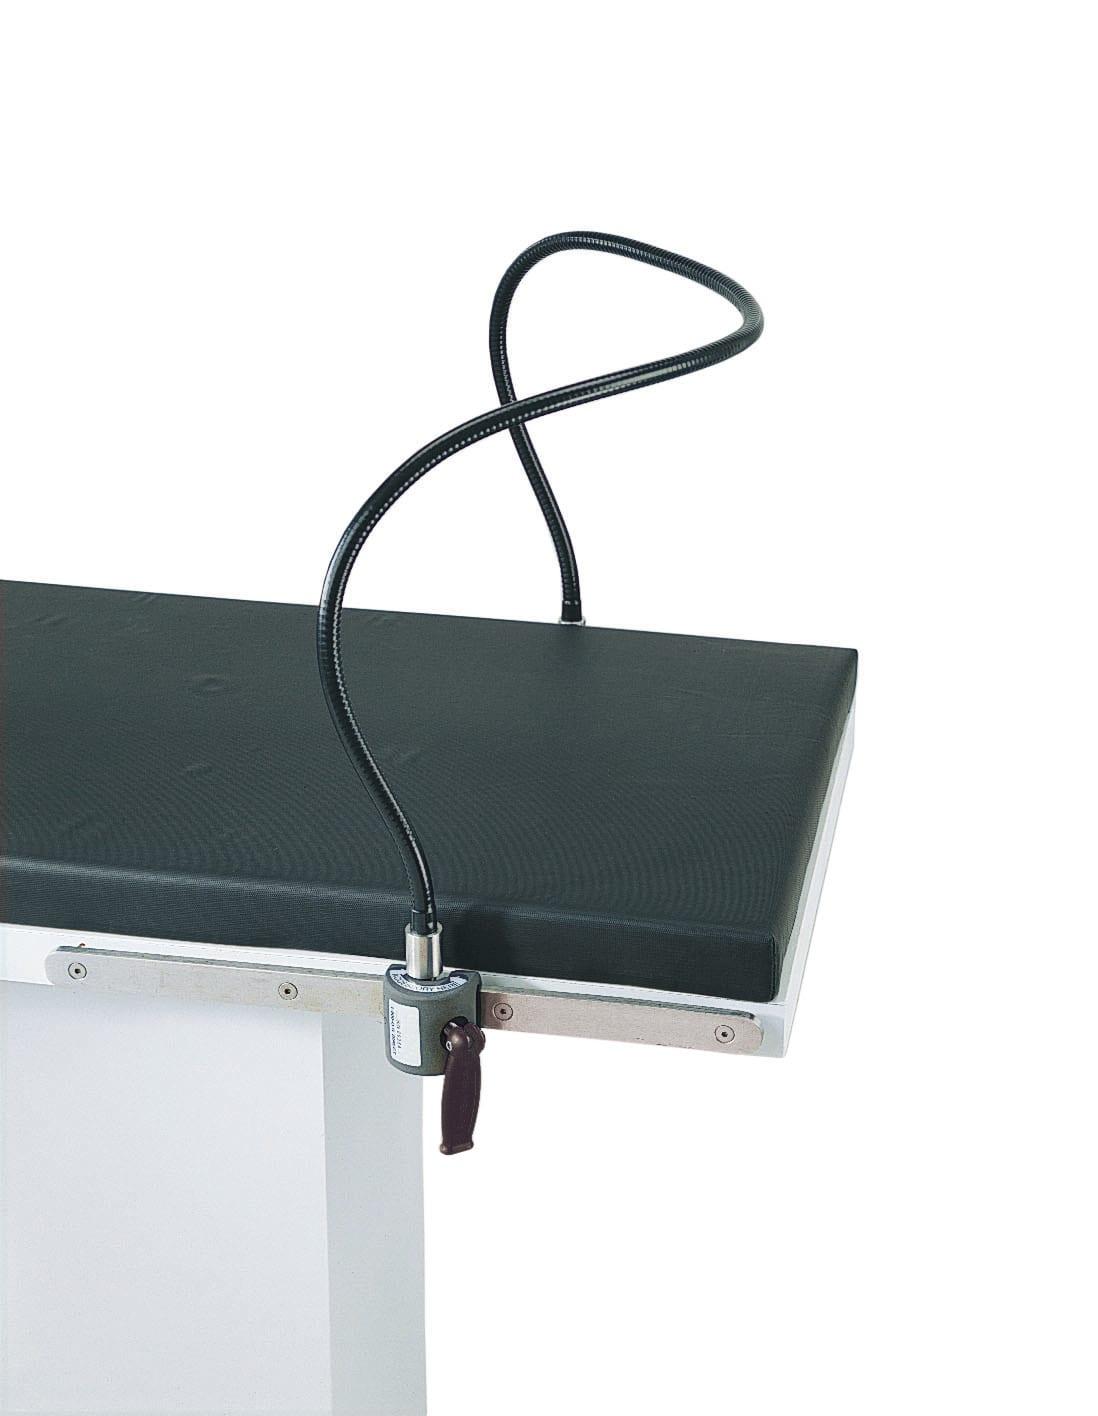 Anaesthesia Screen - Flexible